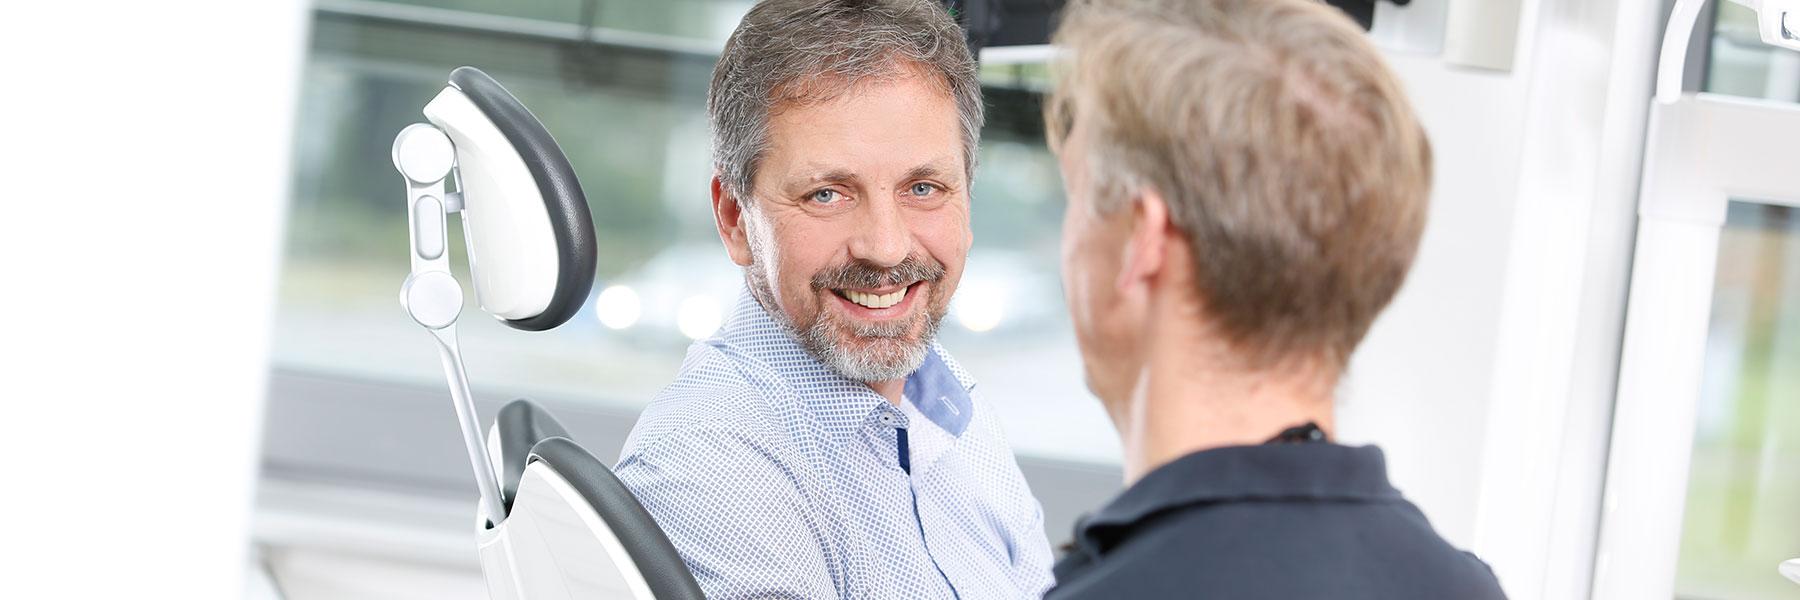 Amalgam entfernen Langenhagen bei Zahnarzt Uwe Prins